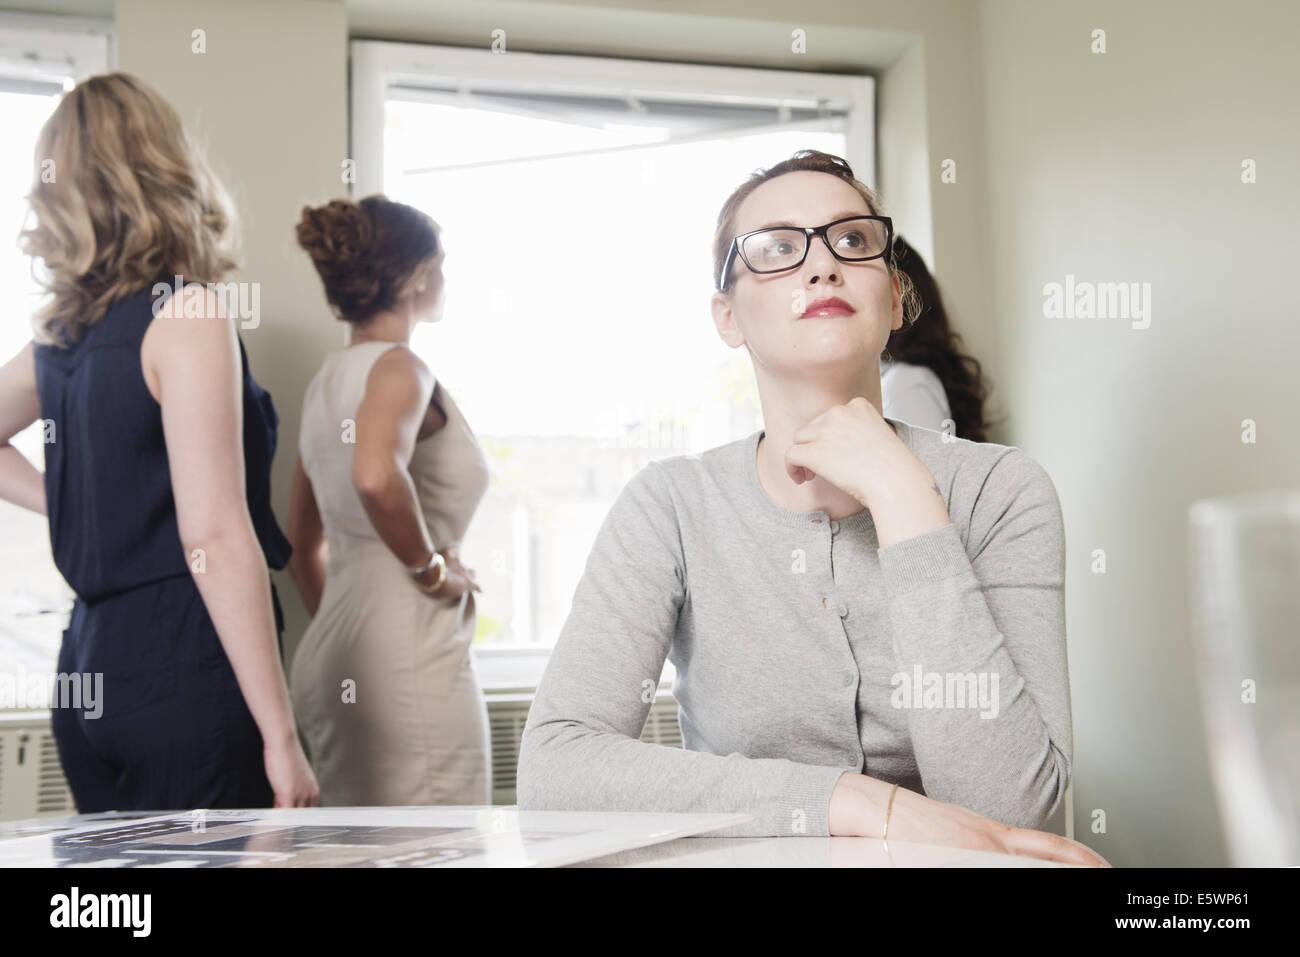 Junge Geschäftsfrau Blick während Kollegen aus Fenster schauen Stockbild